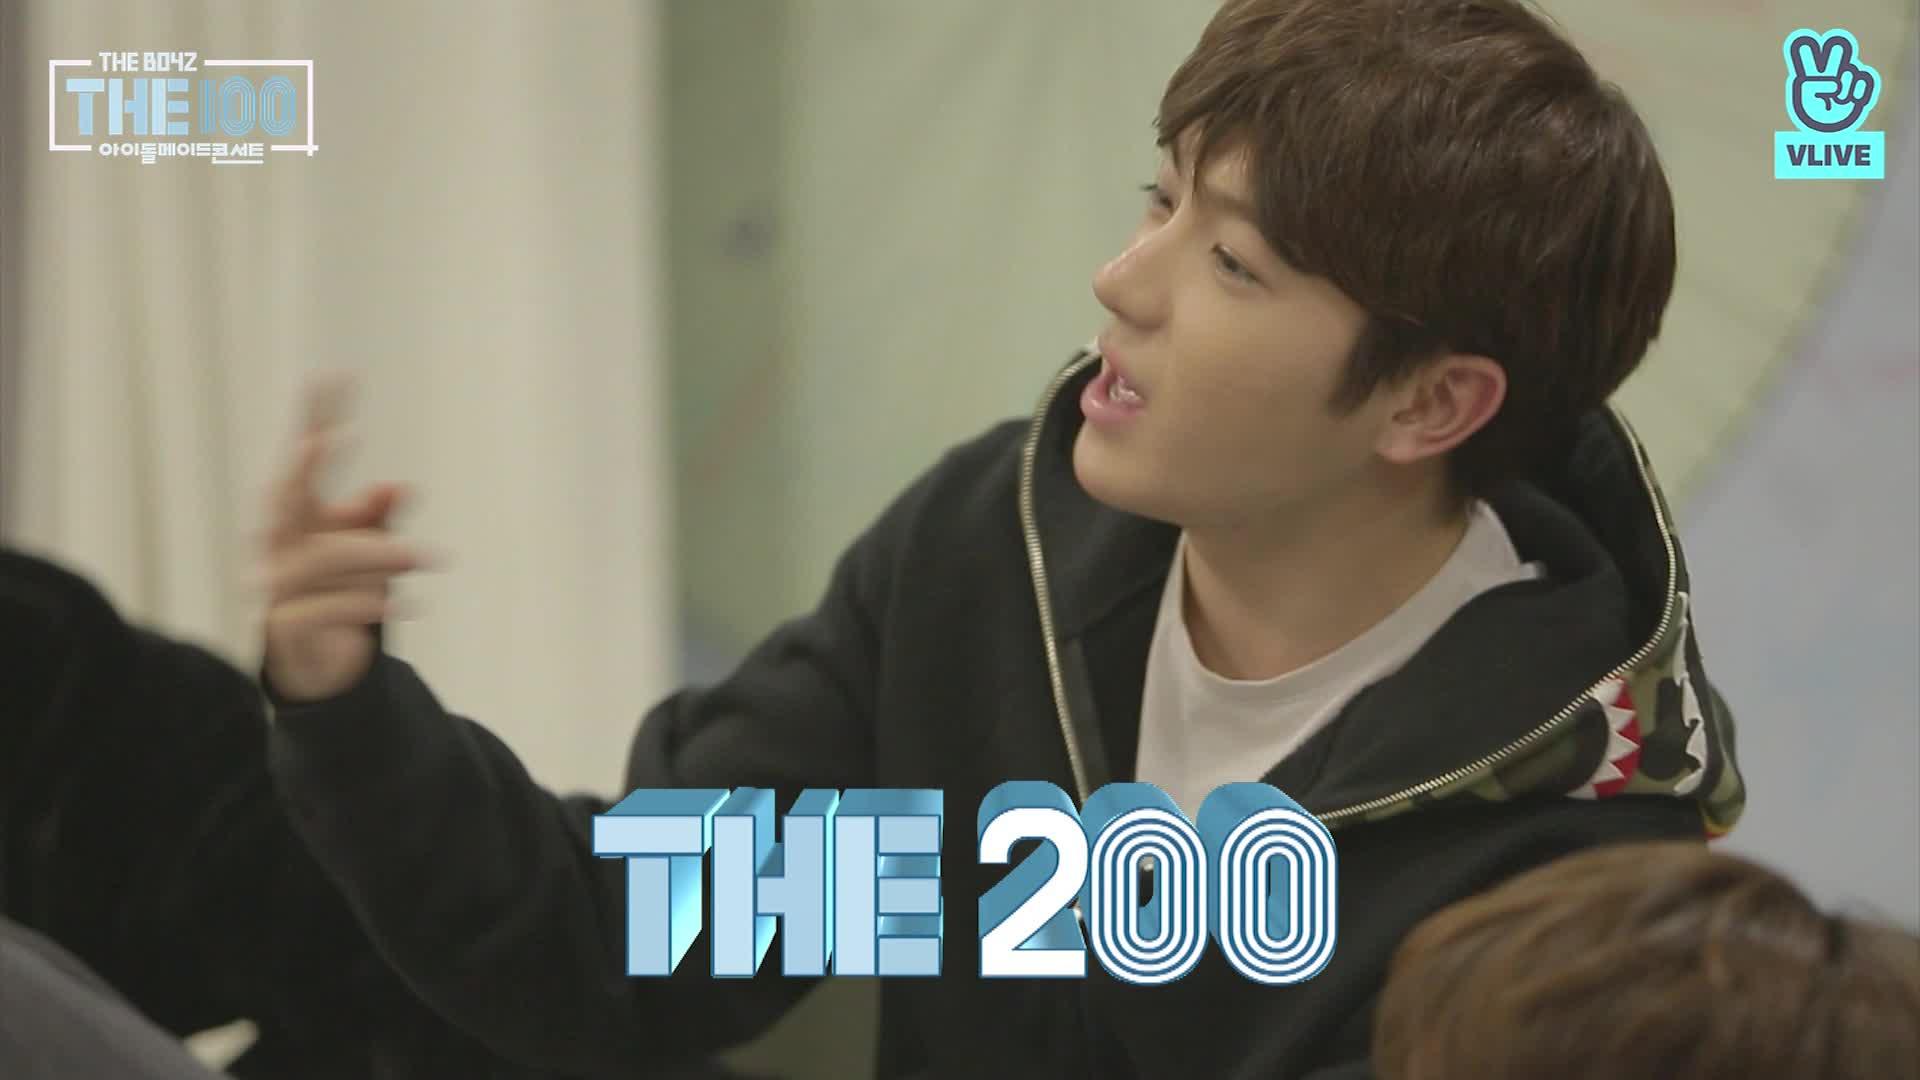 [THE100] THE 200을 향한 큰 그림? - EP 23